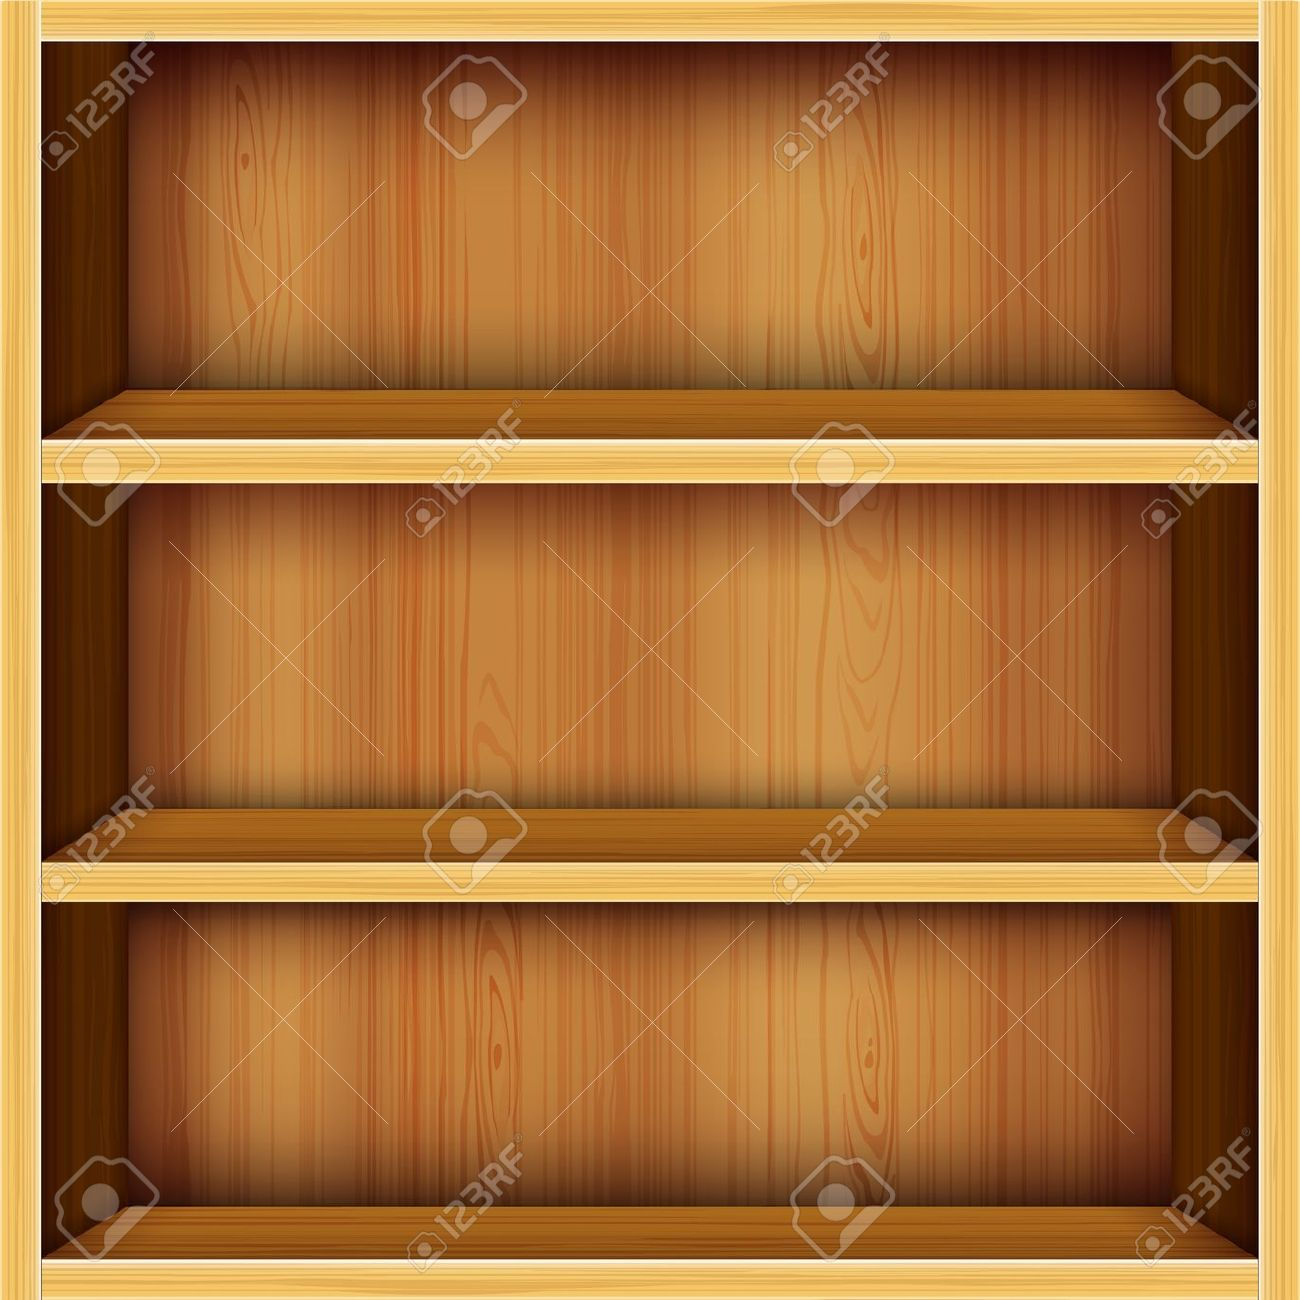 vector wooden shelves design | Clipart Panda - Free Clipart Images